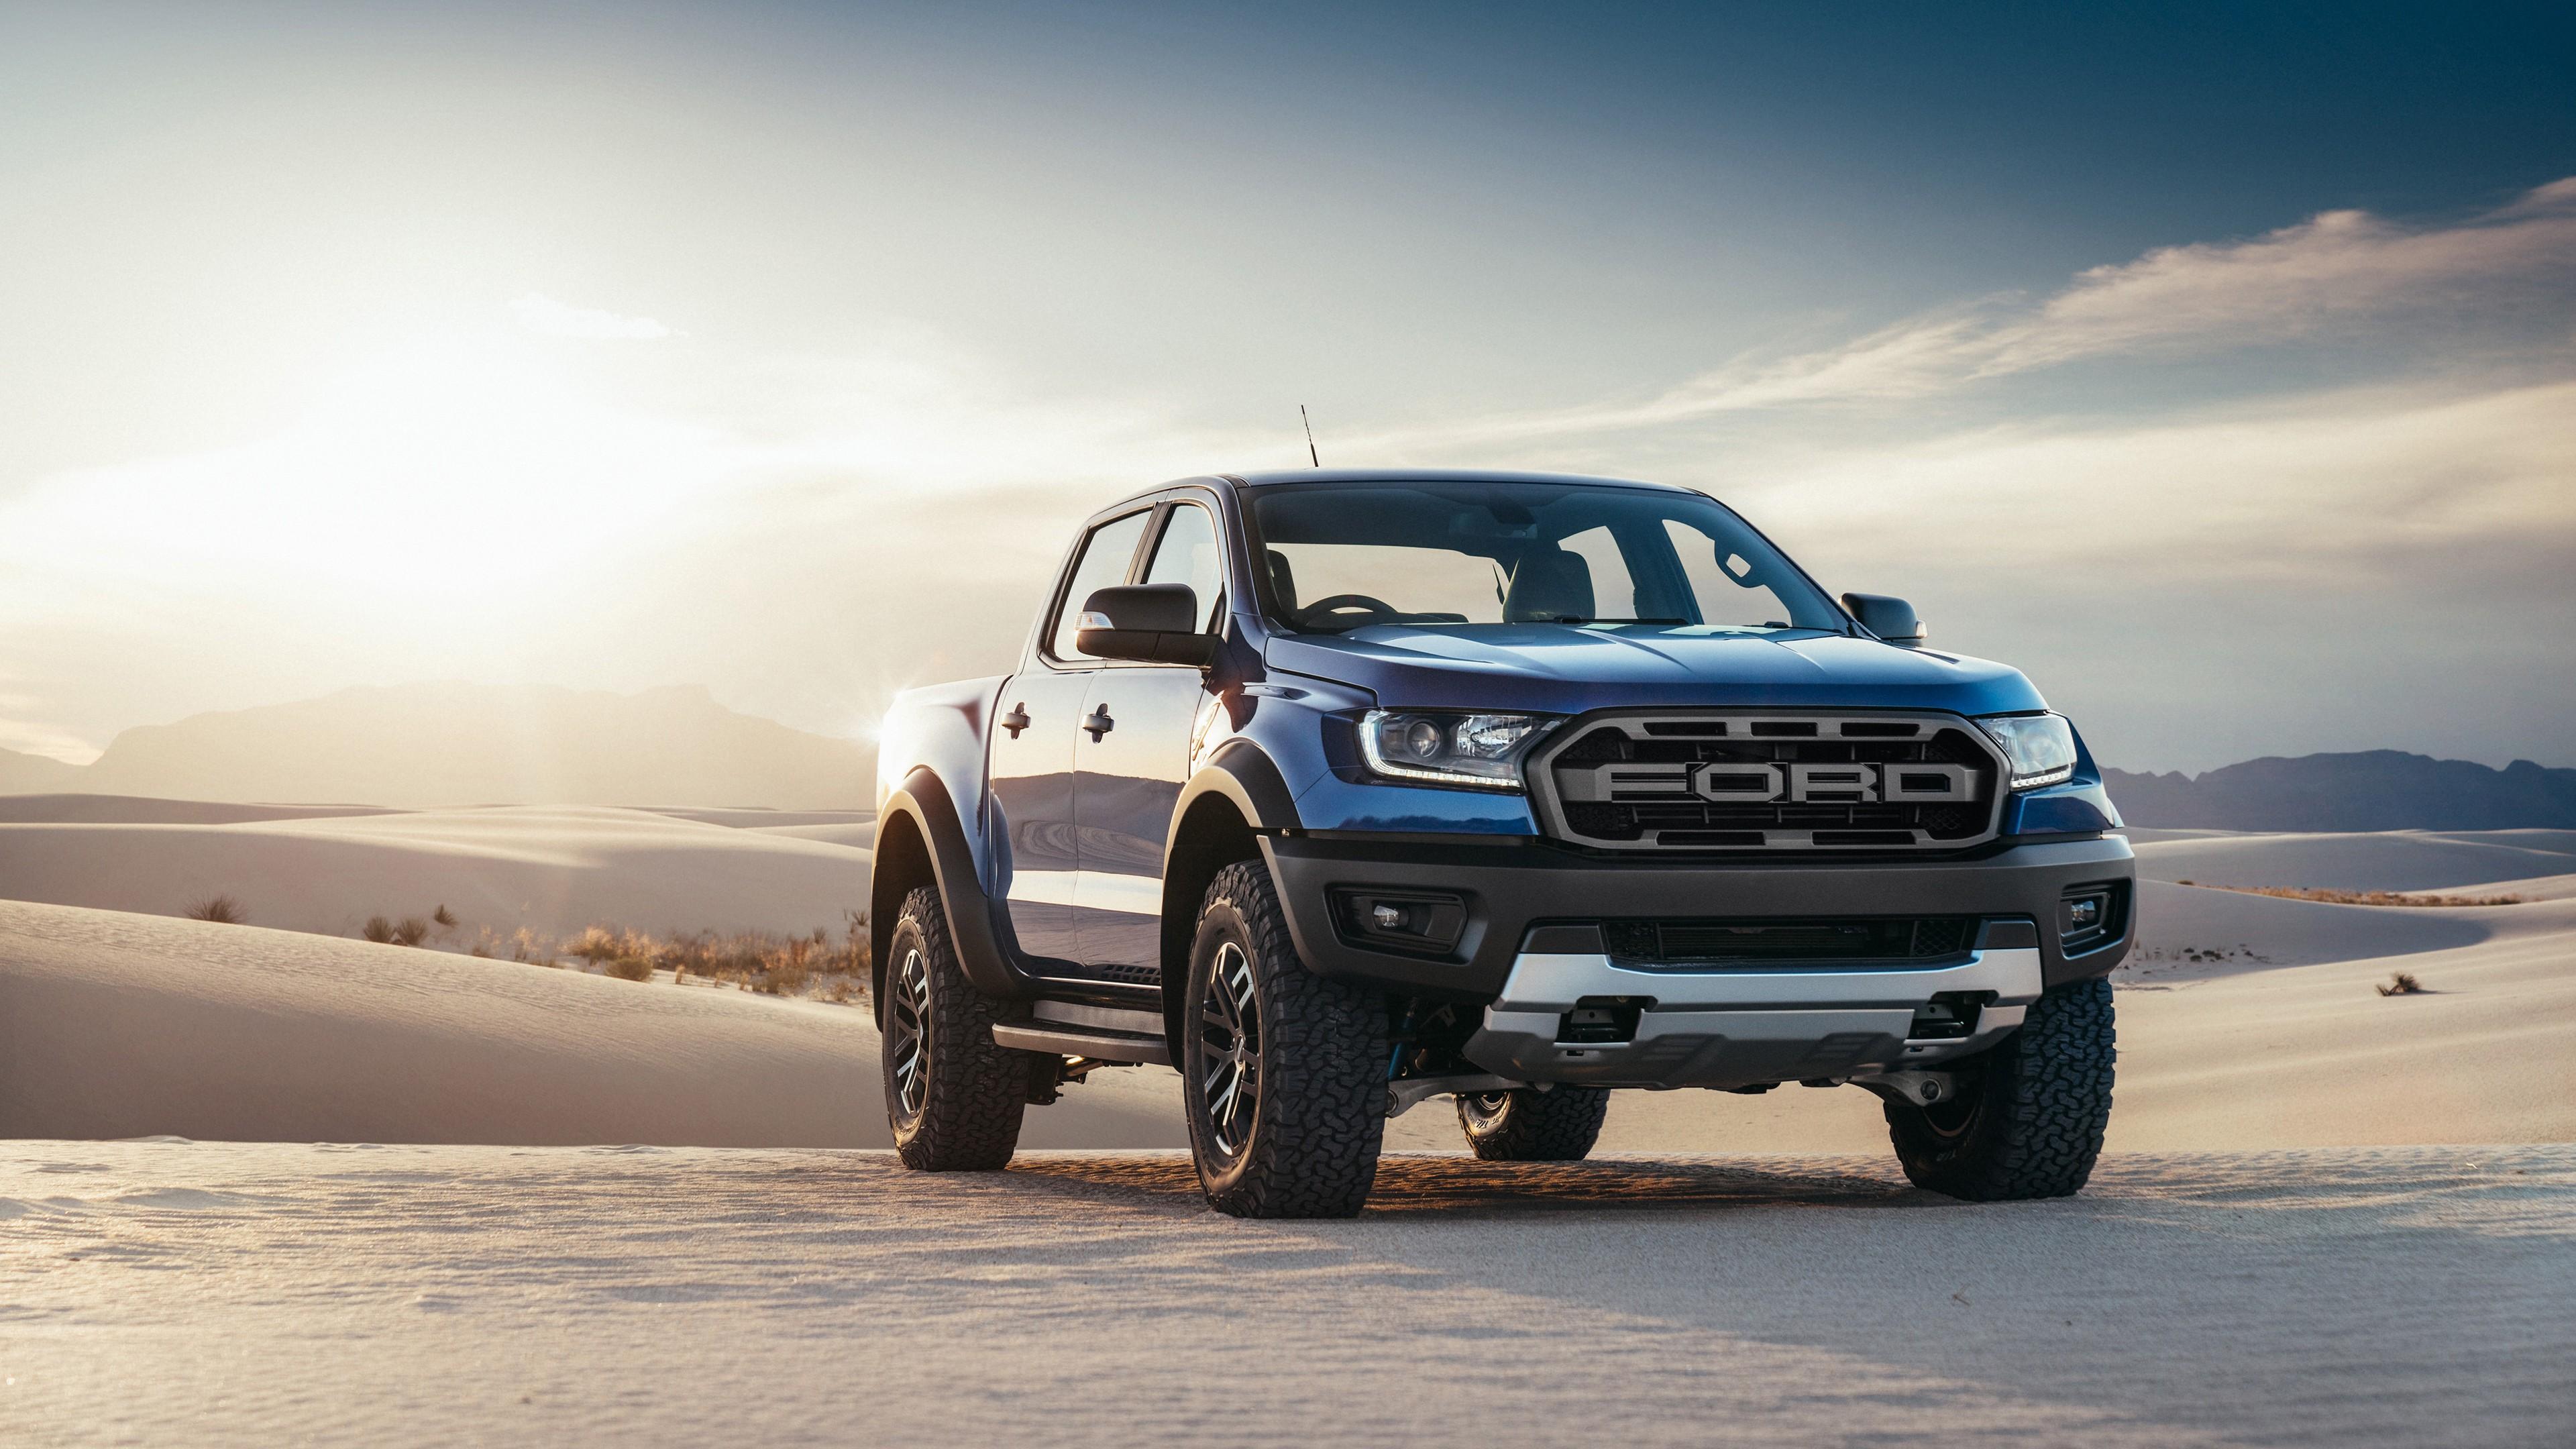 Www Hummer Car Wallpapers Com 2019 Ford Ranger Raptor 4k Wallpaper Hd Car Wallpapers